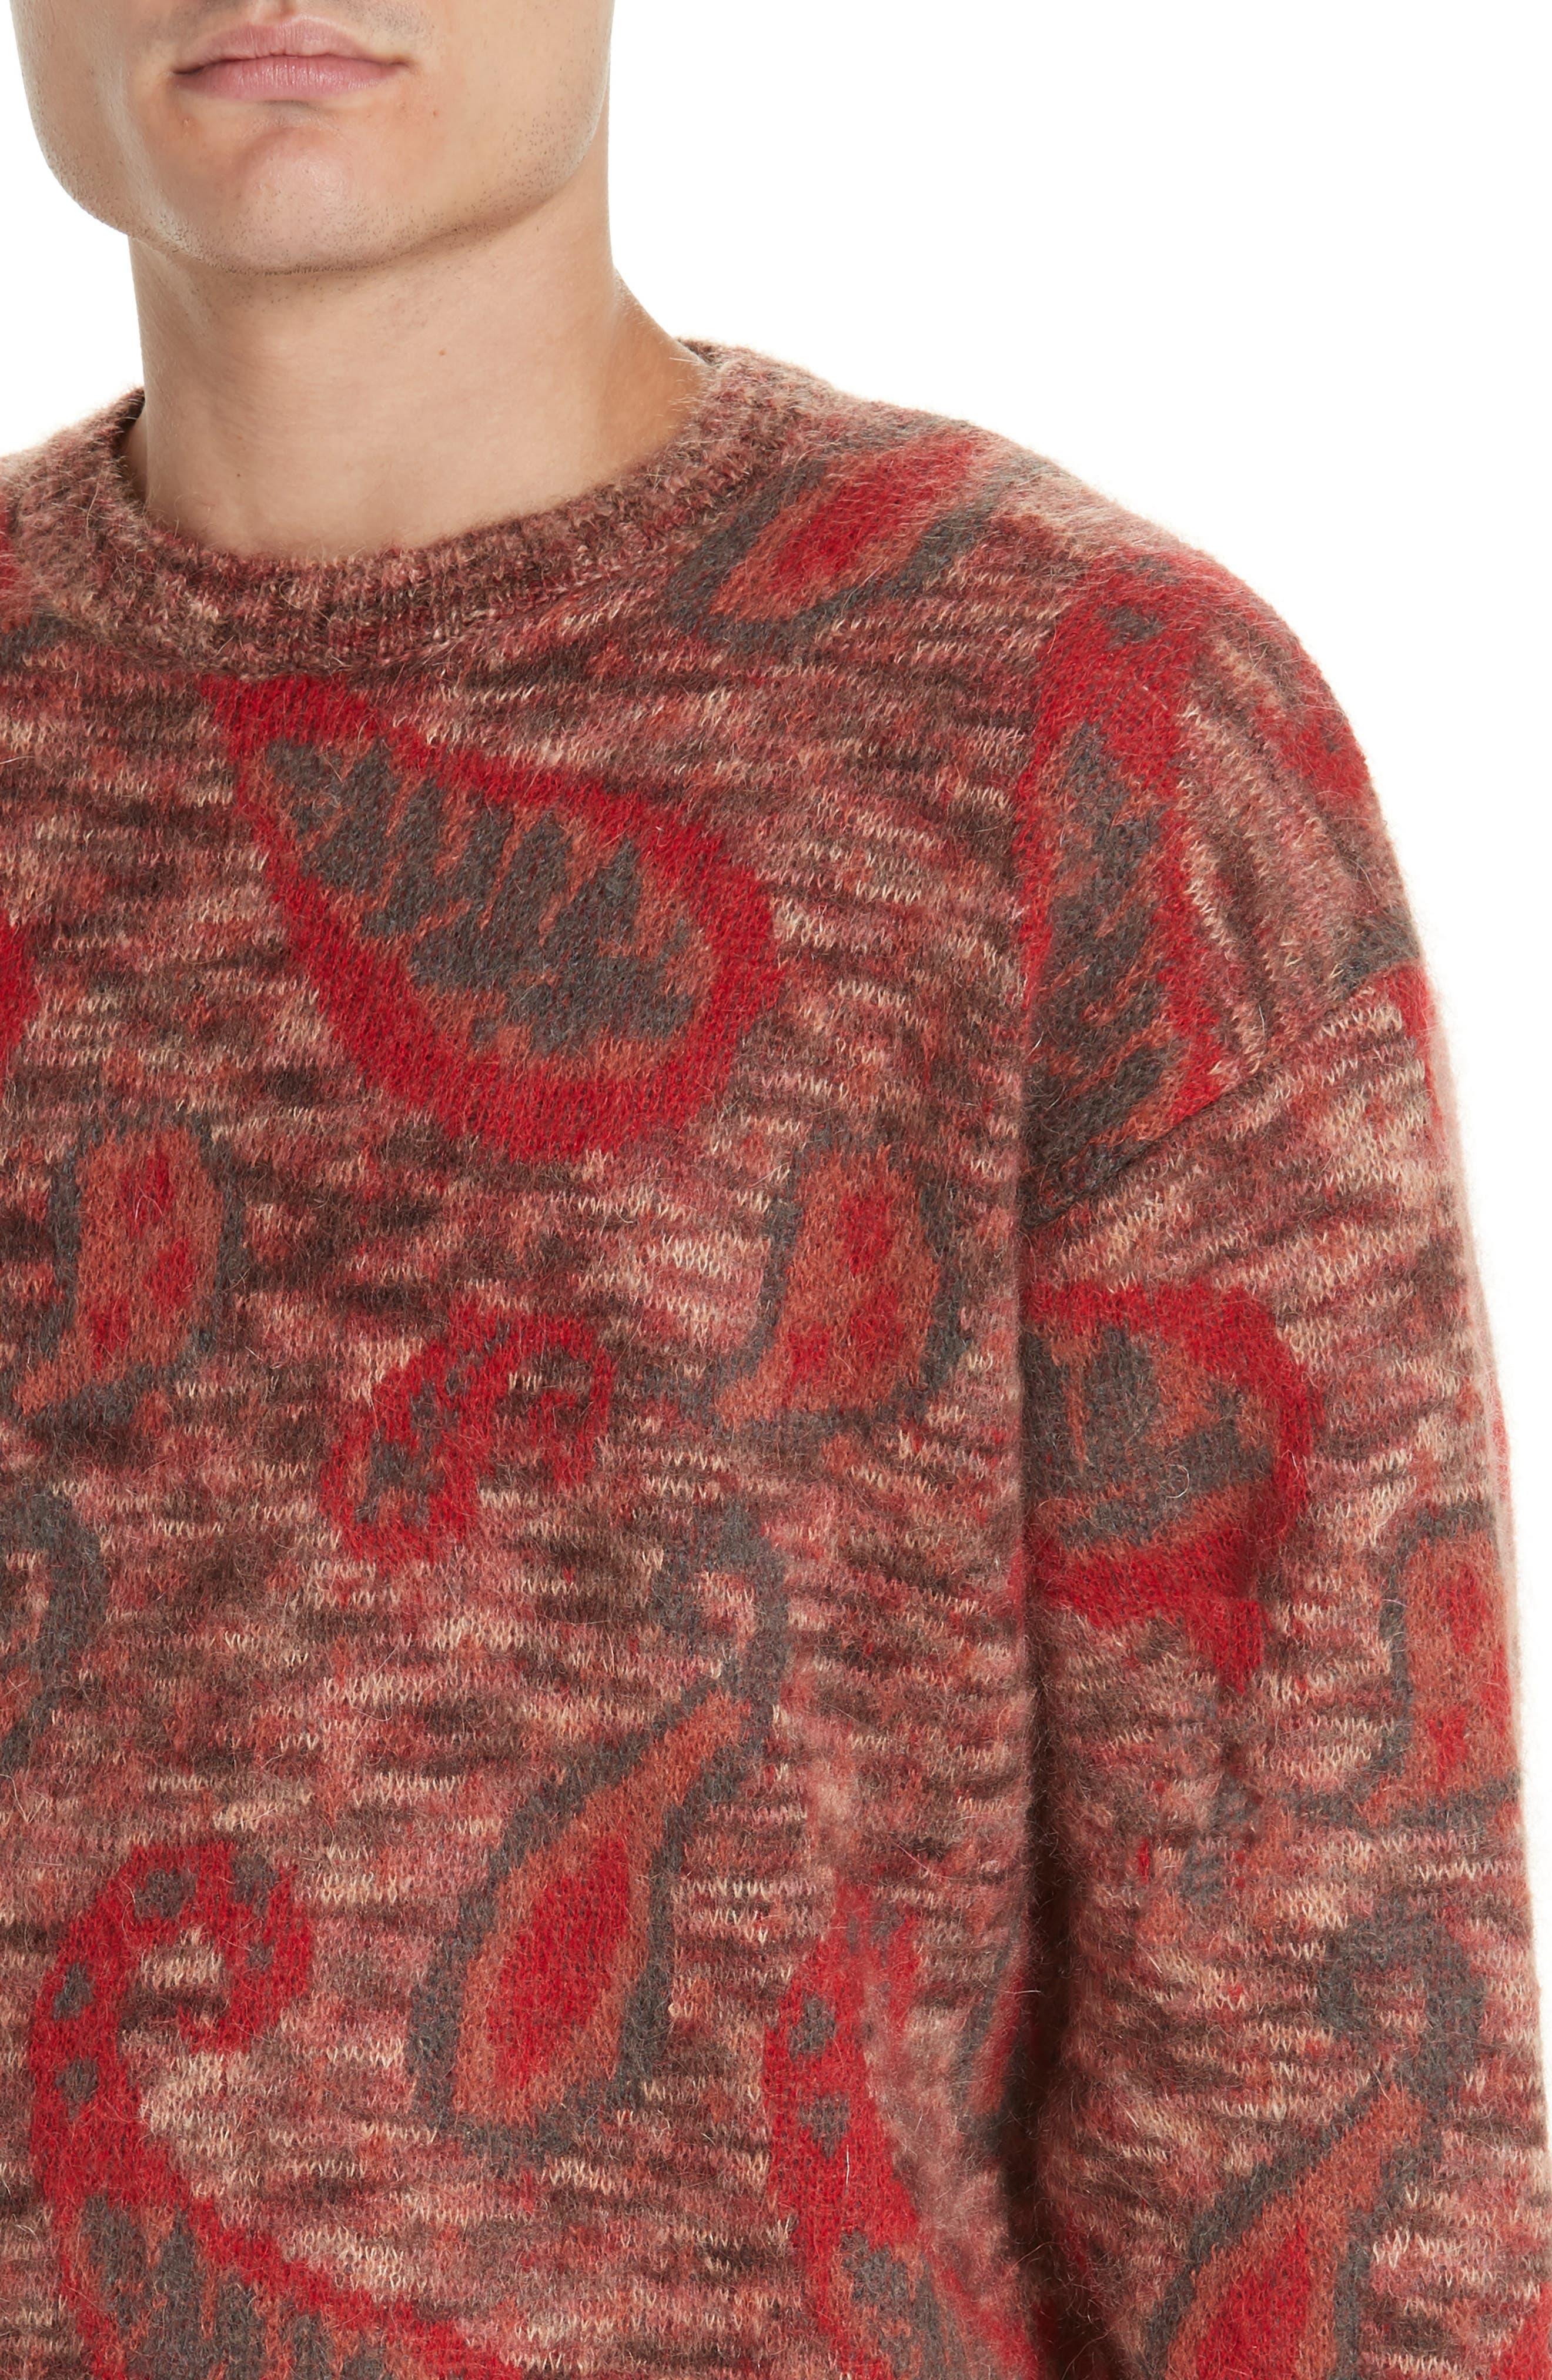 Mohair Blend Paisley Sweater,                             Alternate thumbnail 4, color,                             600